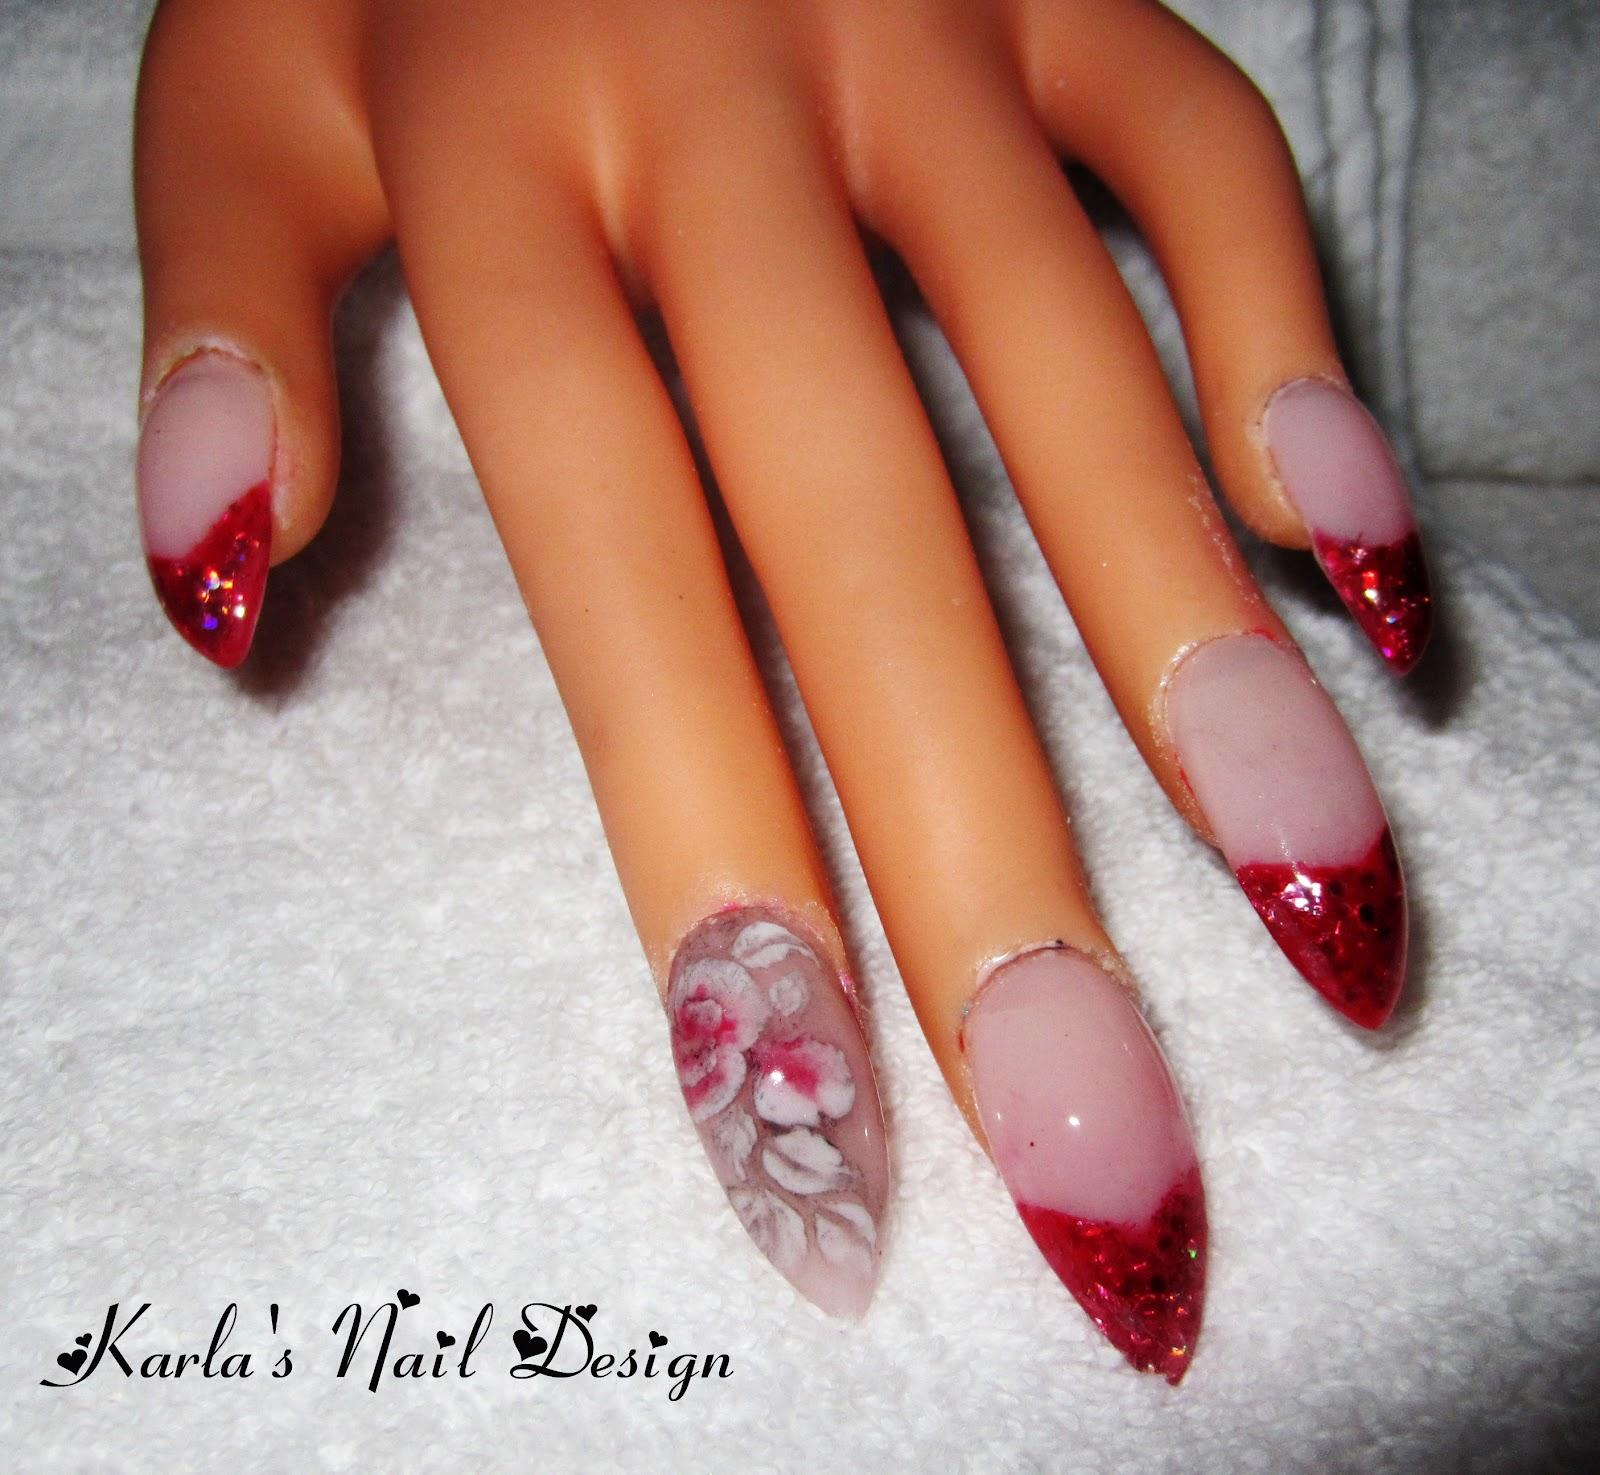 Originail Kolors: the begining of Acrylic nail designs